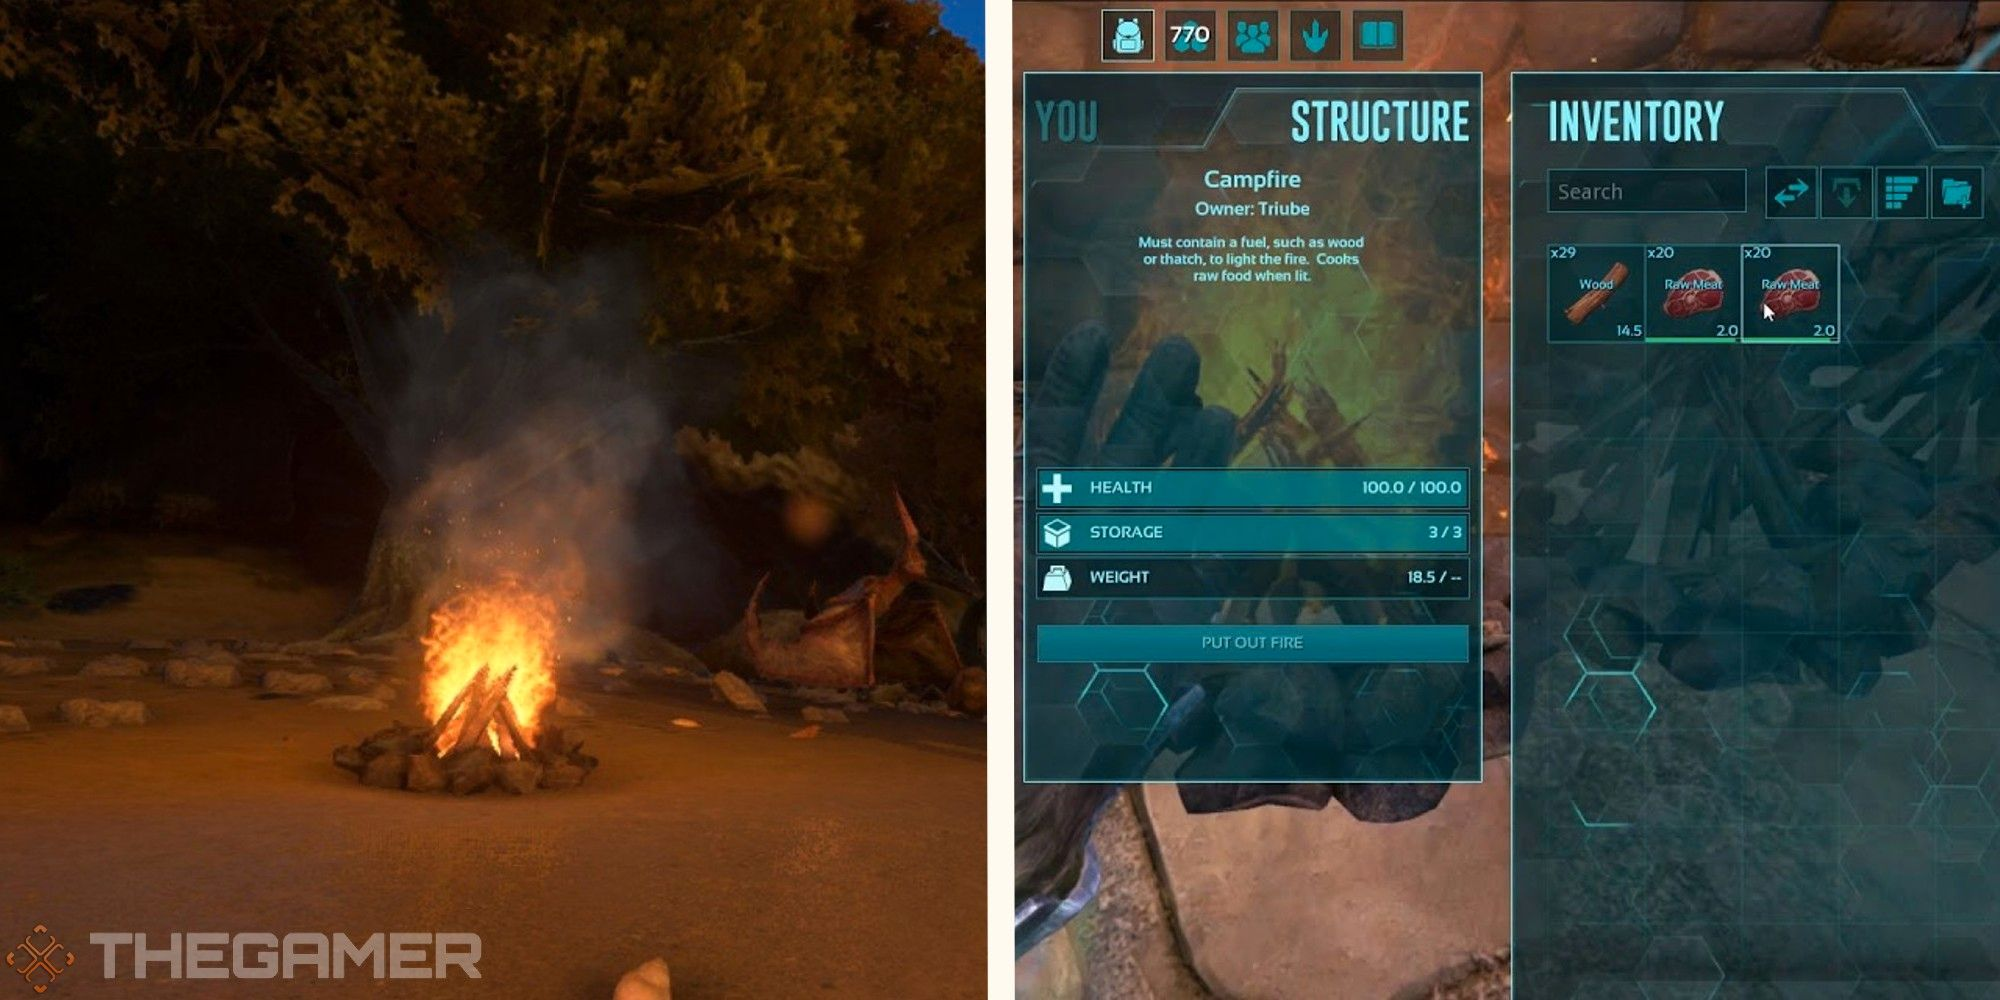 ARK: Survival Evolved - Cómo encender una fogata